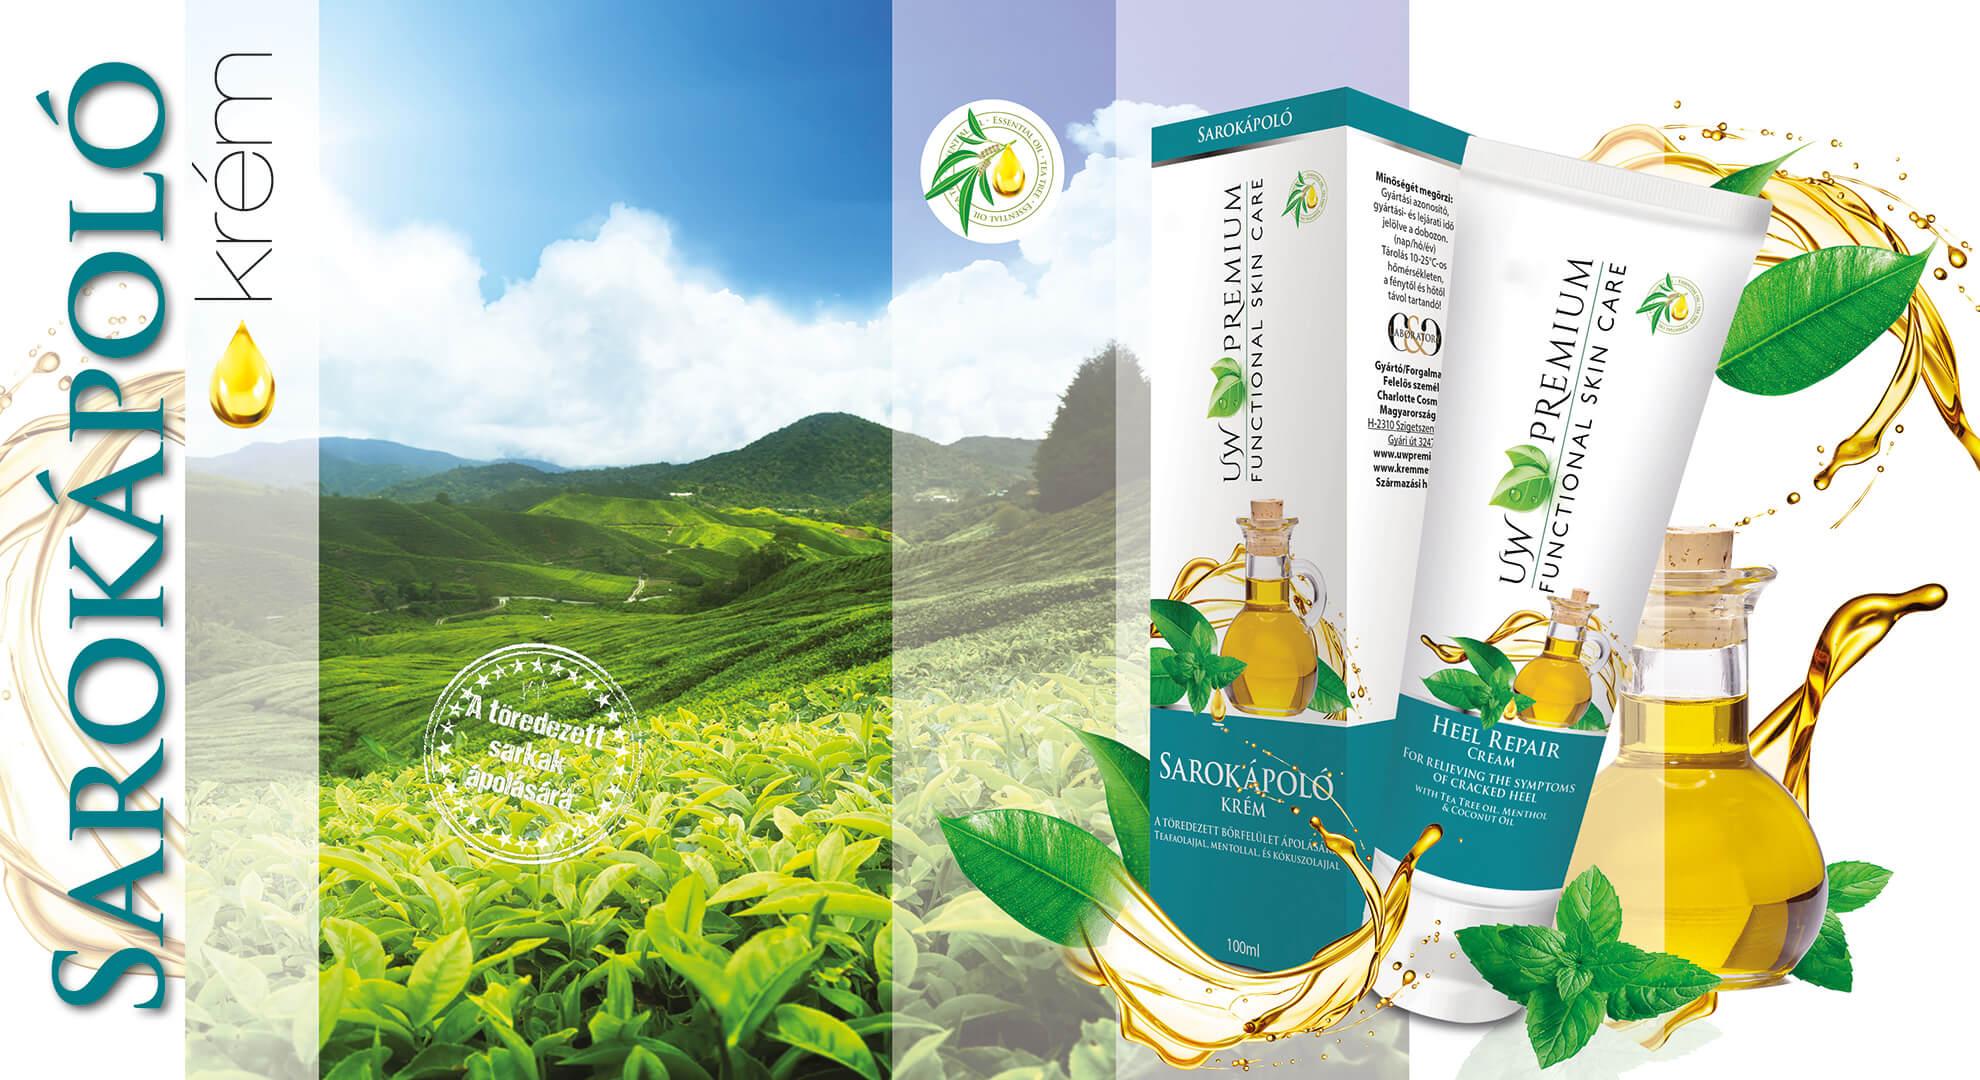 UW Premium sarokápoló teafaolajjal